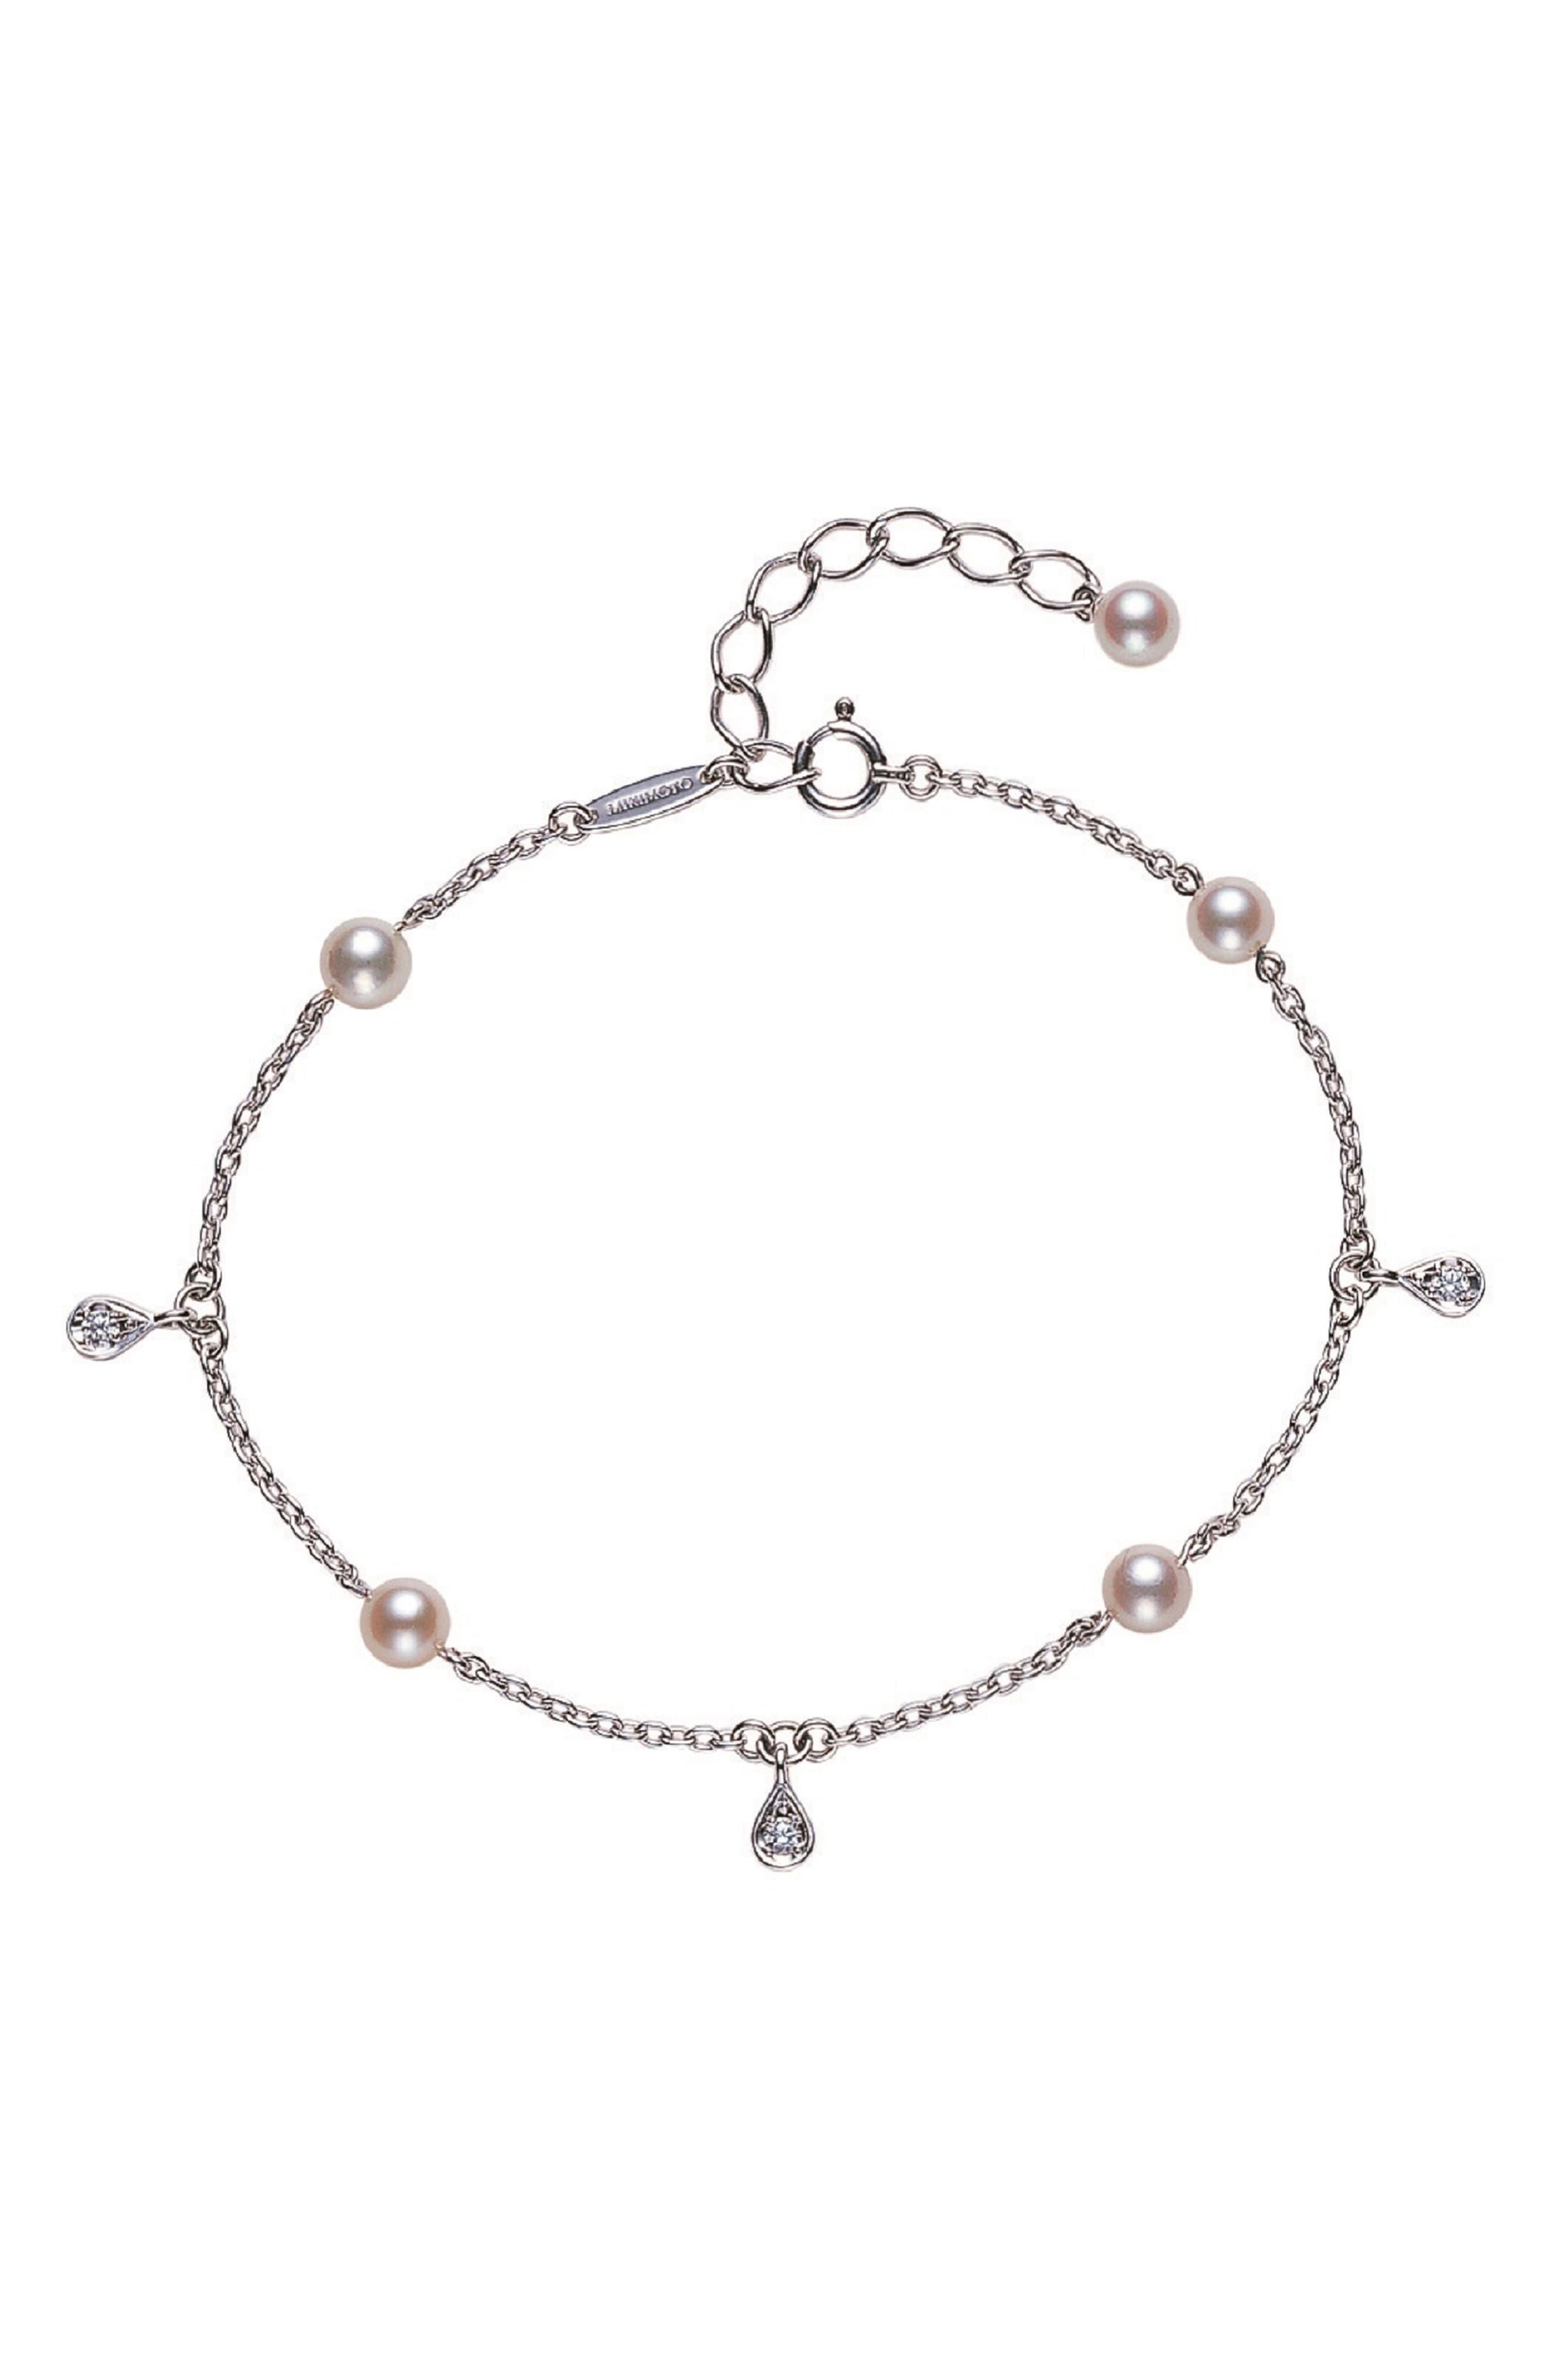 Pearl & Diamond Bracelet